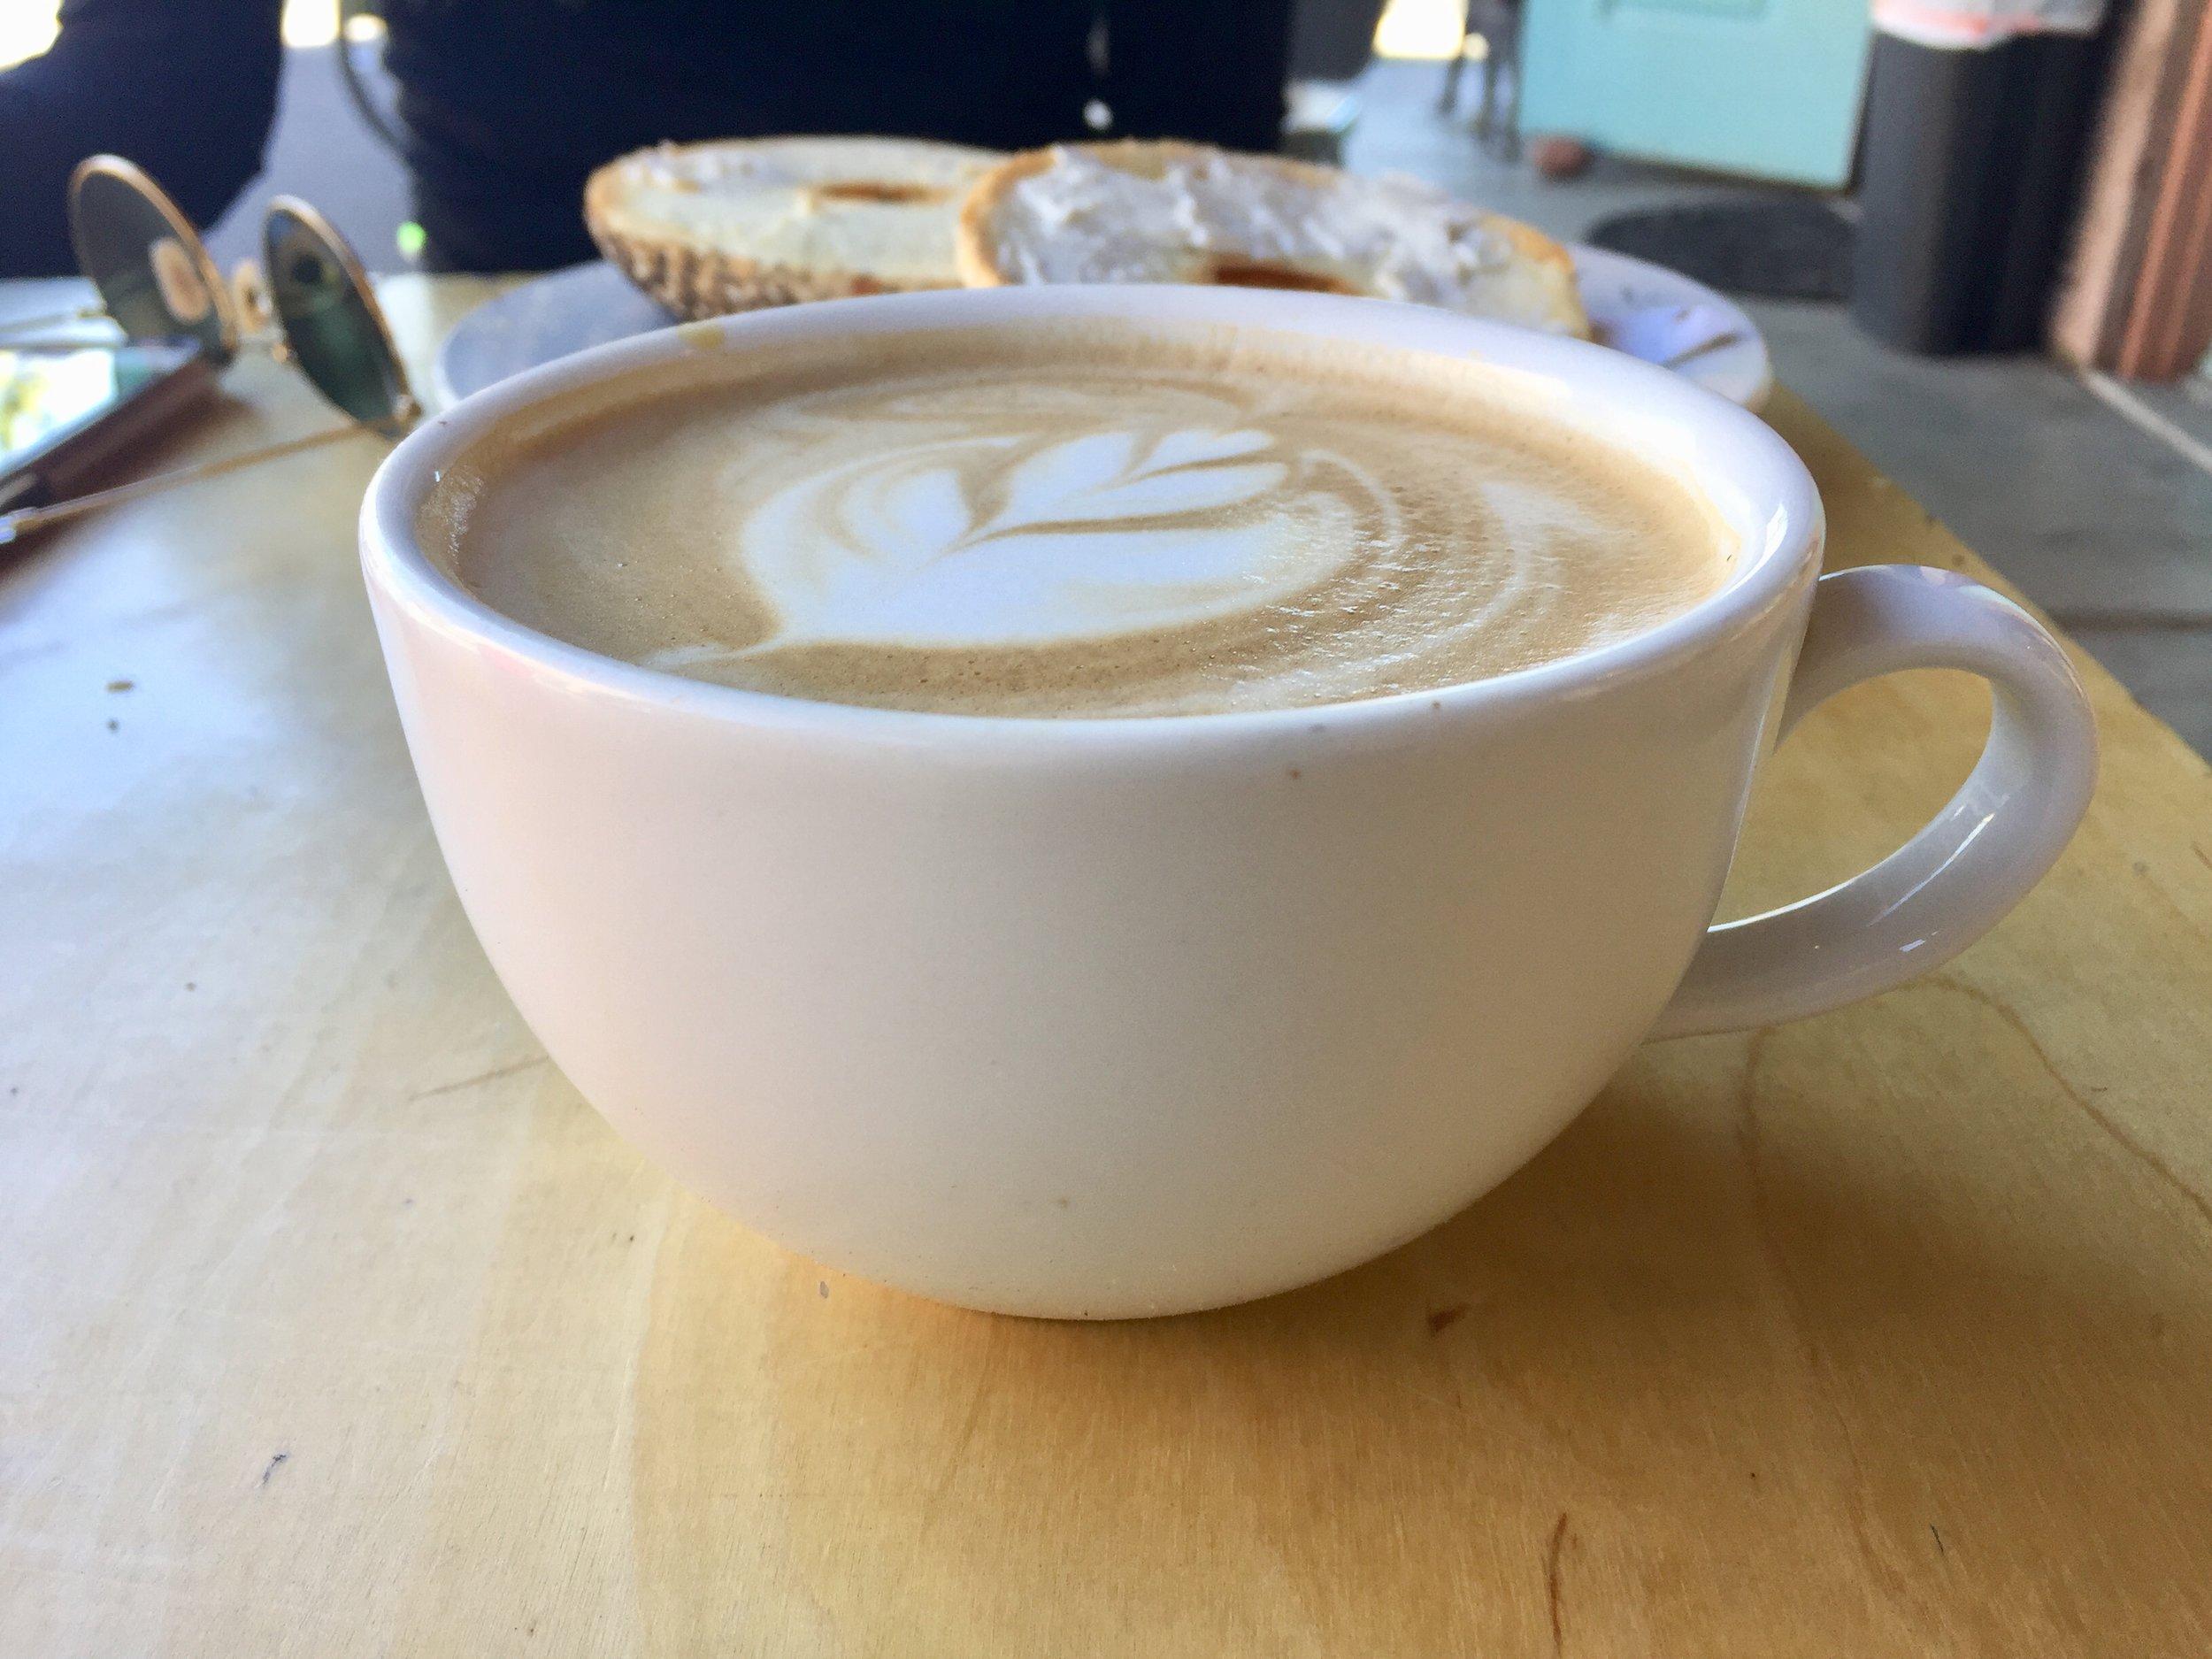 King's Coffee in Tempe